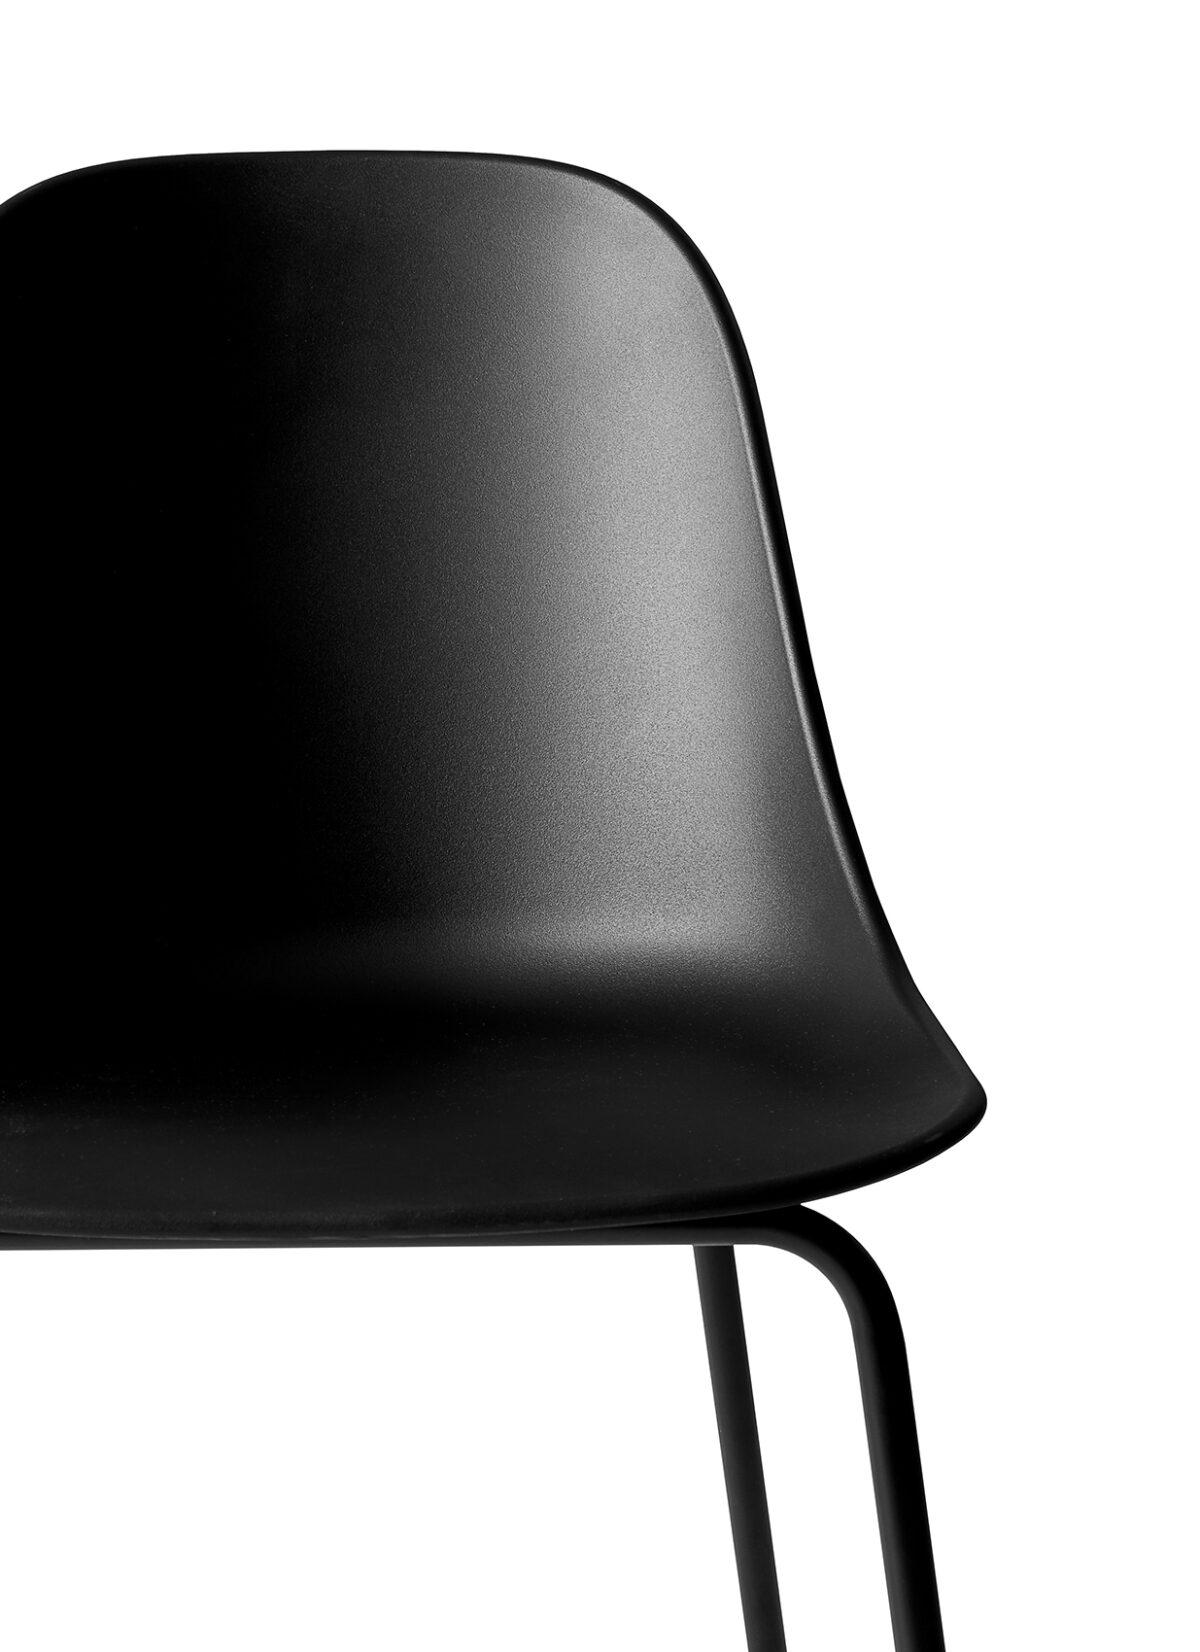 9295539 Harbour Side Counter Chair Black Black CloseUp 1